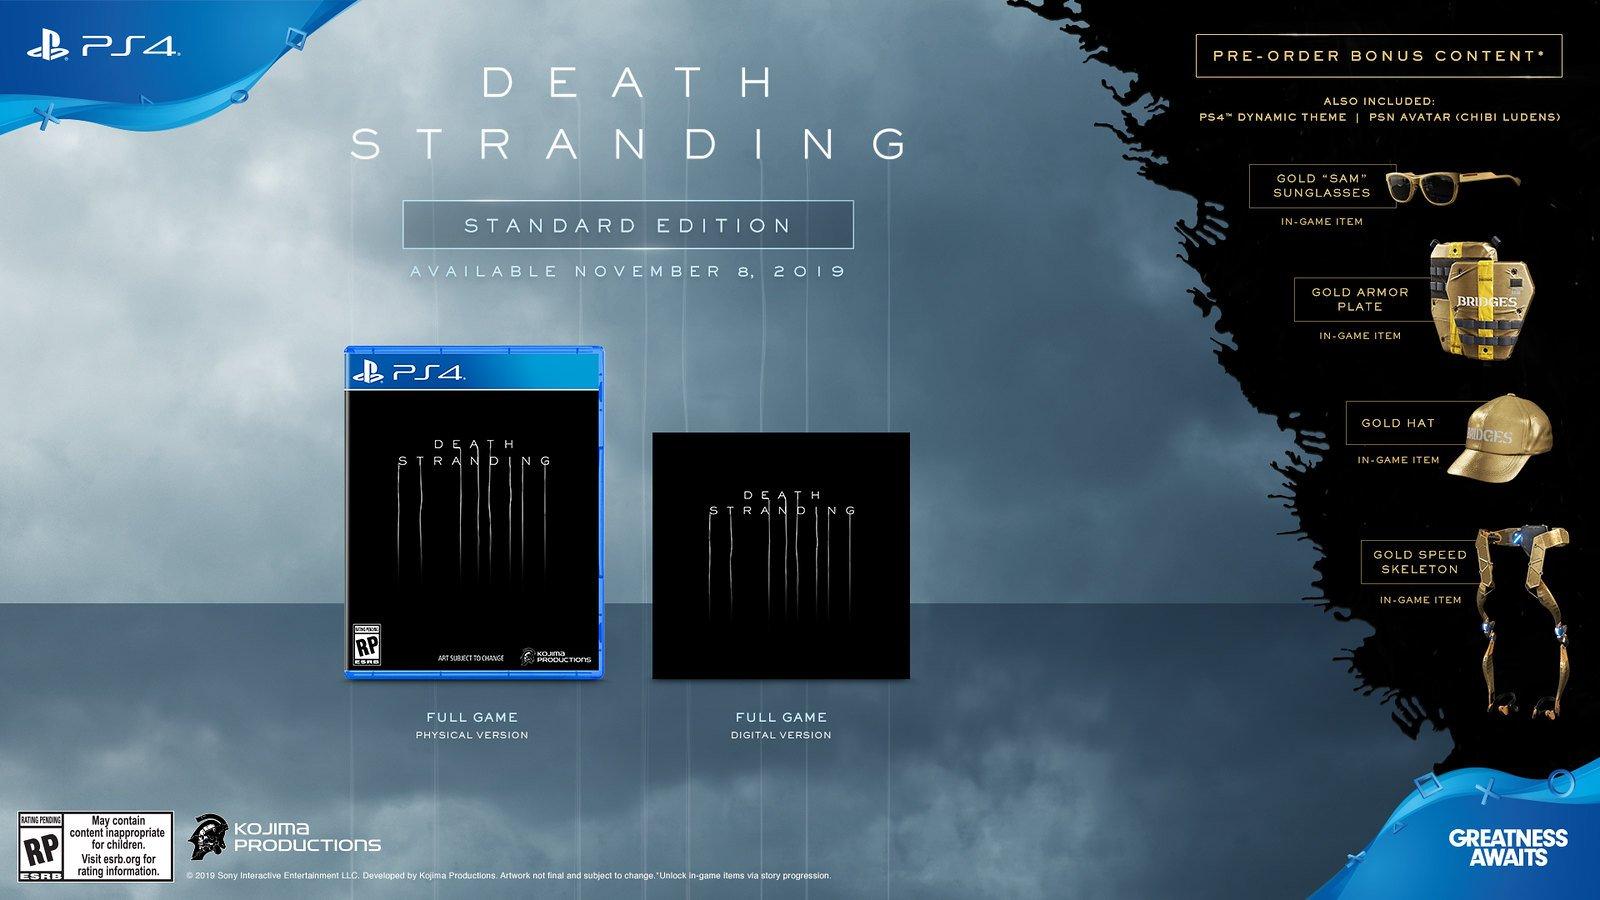 Death Stranding Standard Edition preorder bonuses